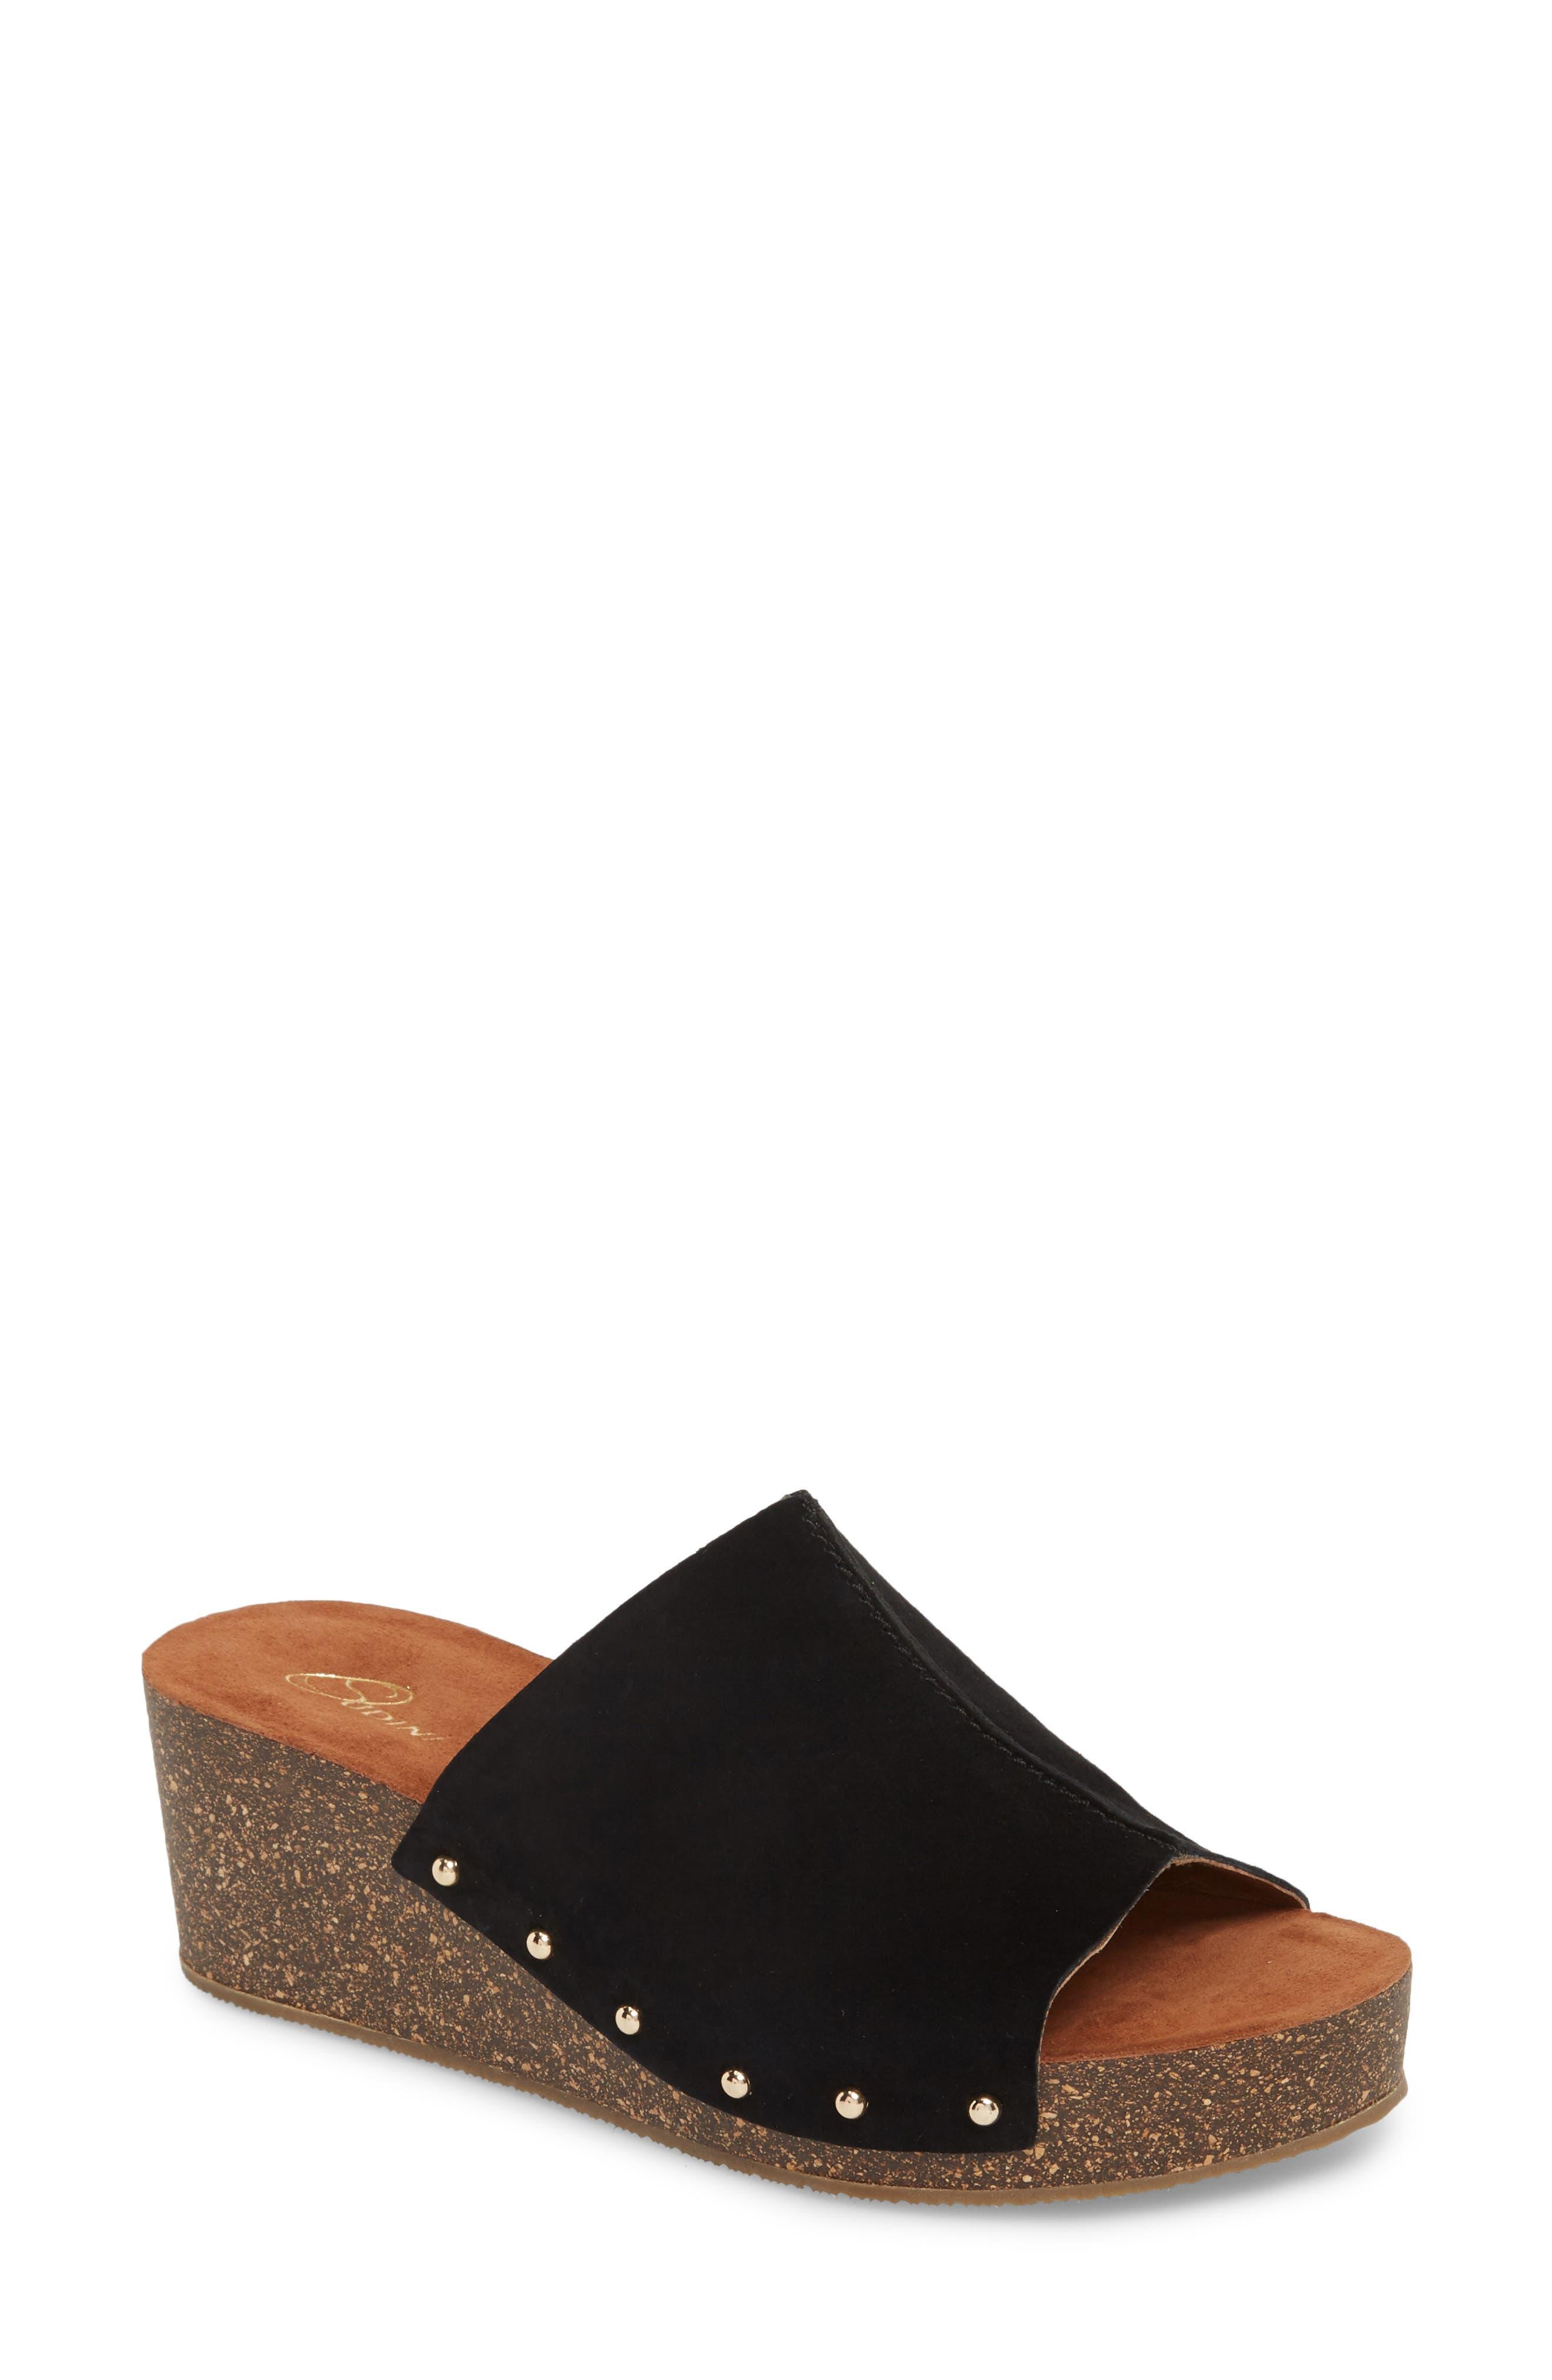 Pavia Wedge Mule,                         Main,                         color, Black Leather